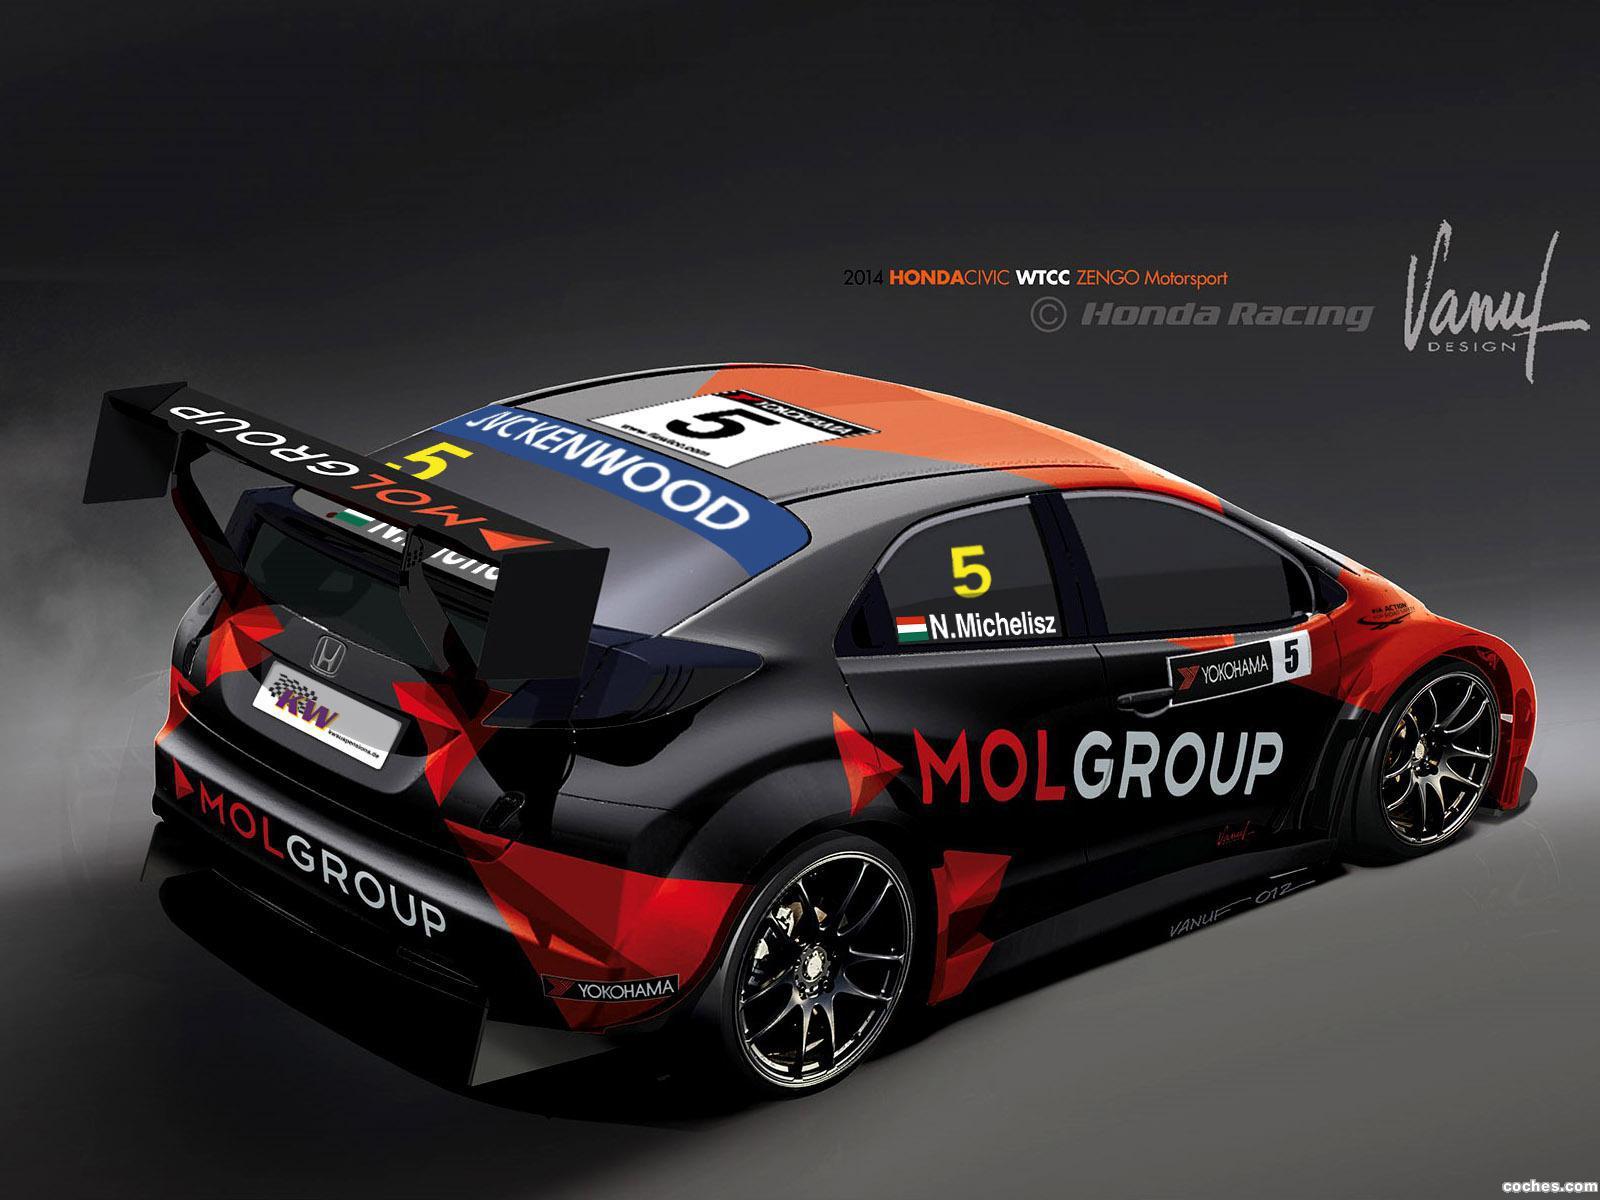 Foto 3 de Honda Civic WTCC Zengo Motorsport 2014